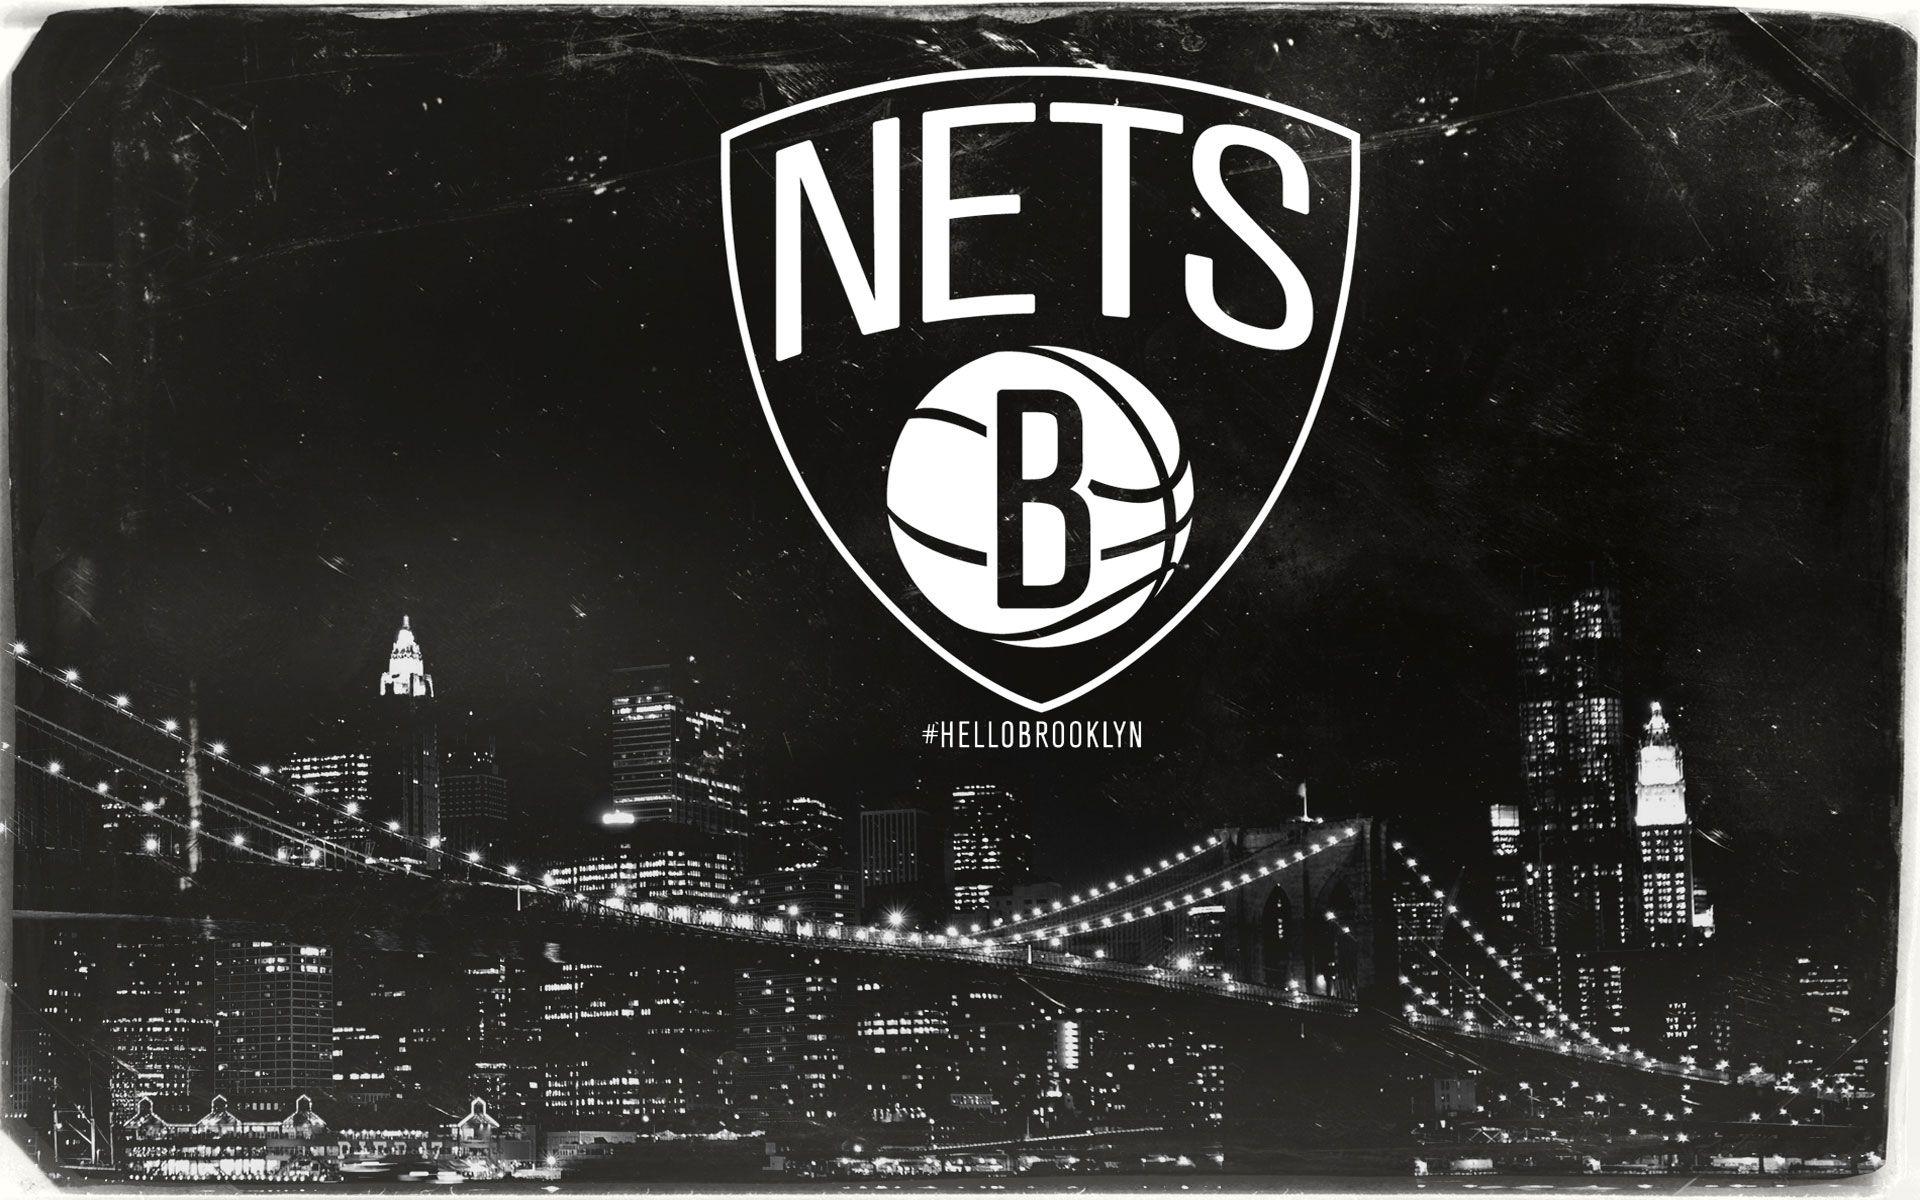 Brooklyn Nets Wallpaper Brooklyn Nets Barclays Craignovoa Brooklyn Nets Brooklyn Nets Team Brooklyn Basketball